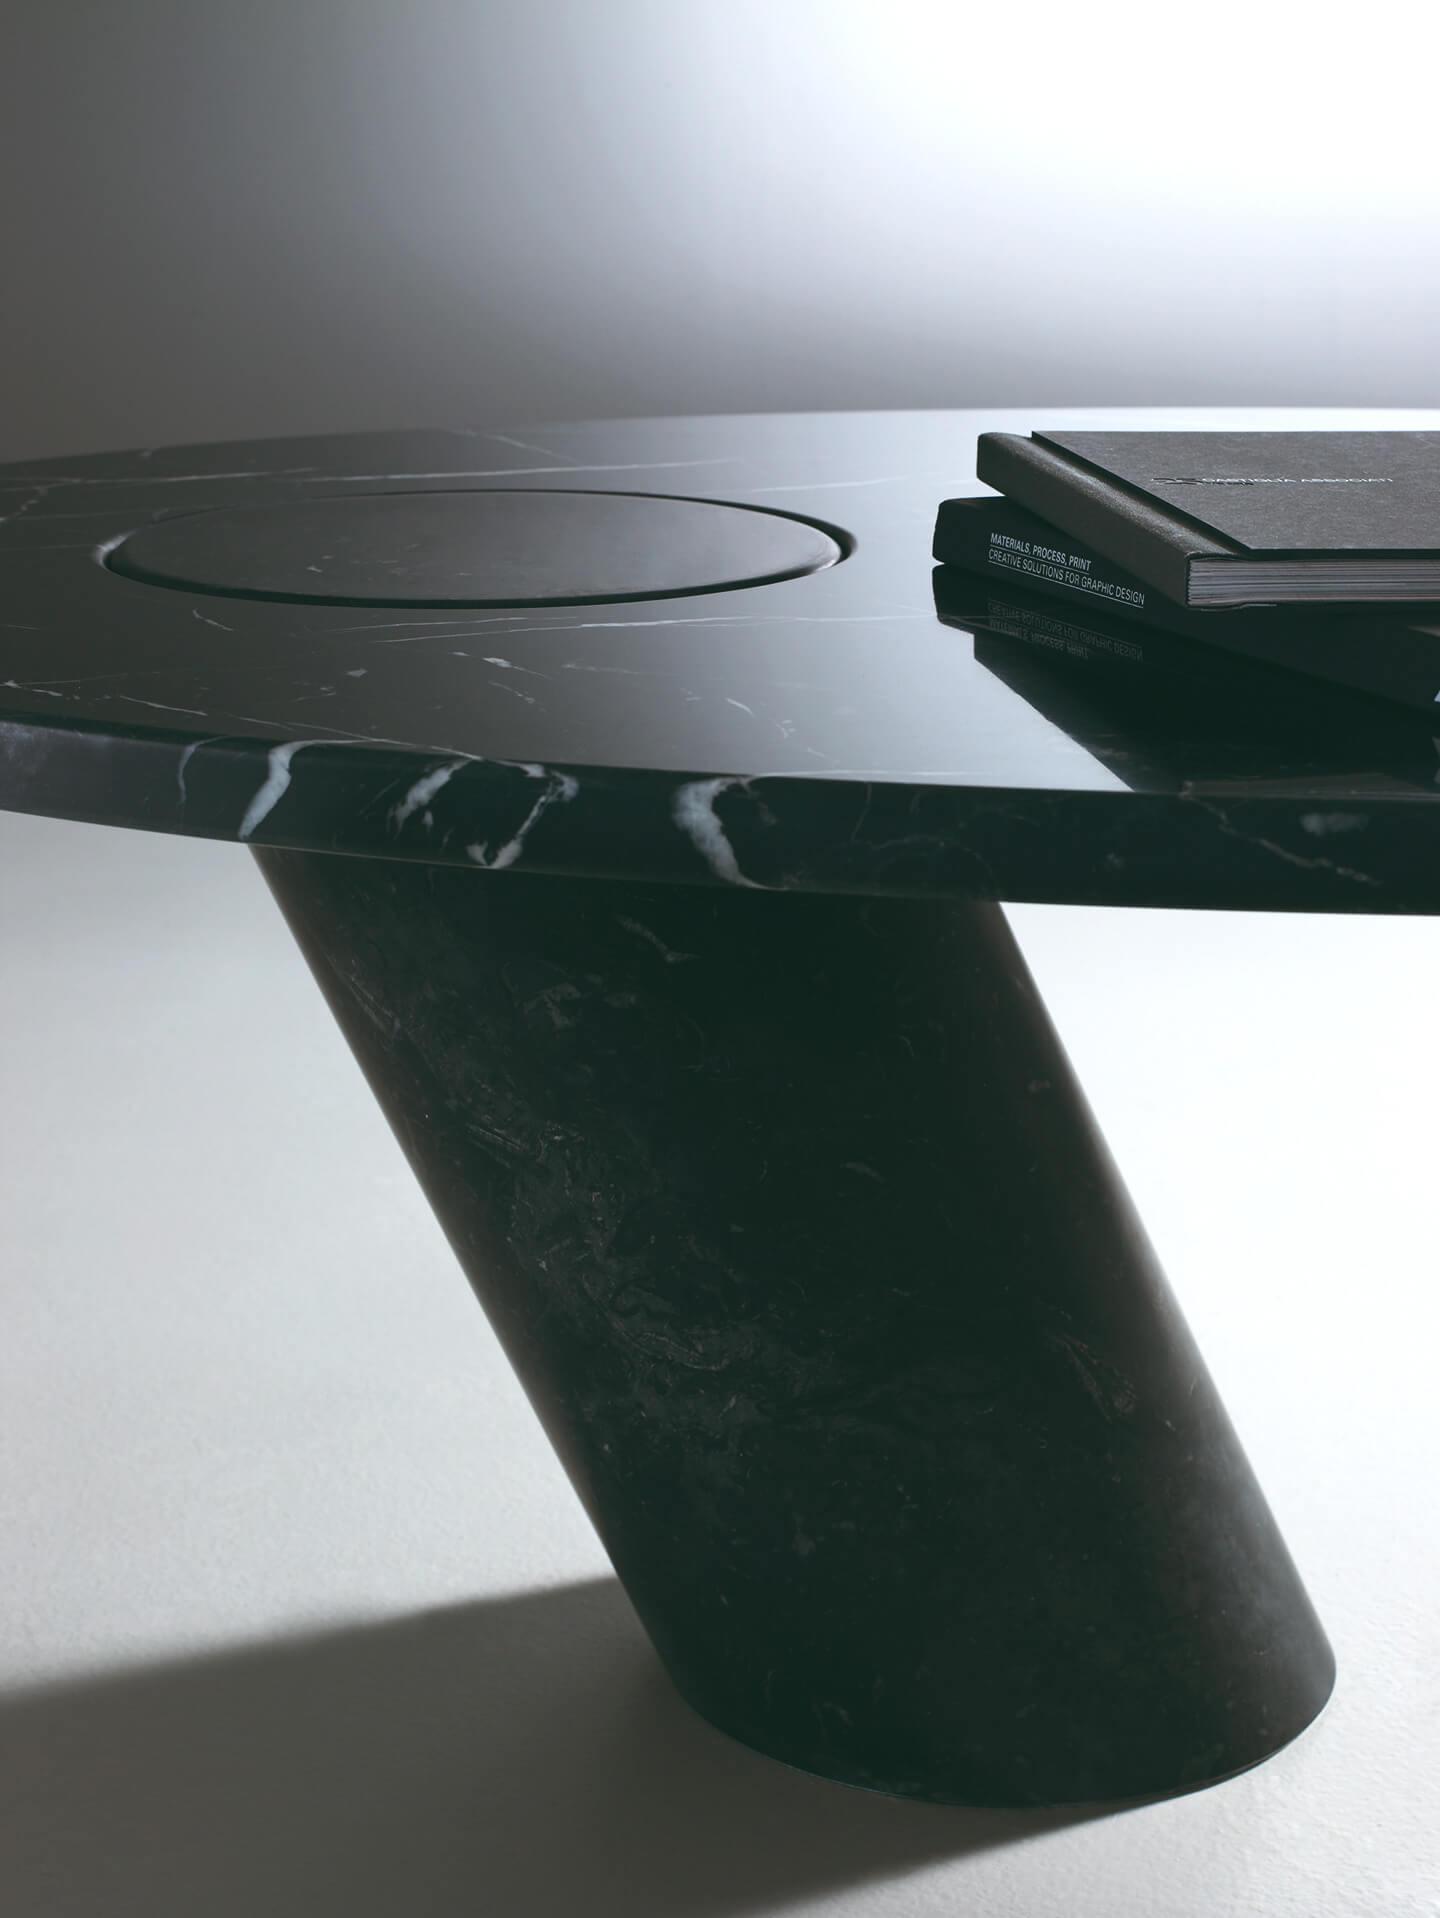 TinnappleMetz-agapecase-mangiarotti-Eccentrico-Desk-02